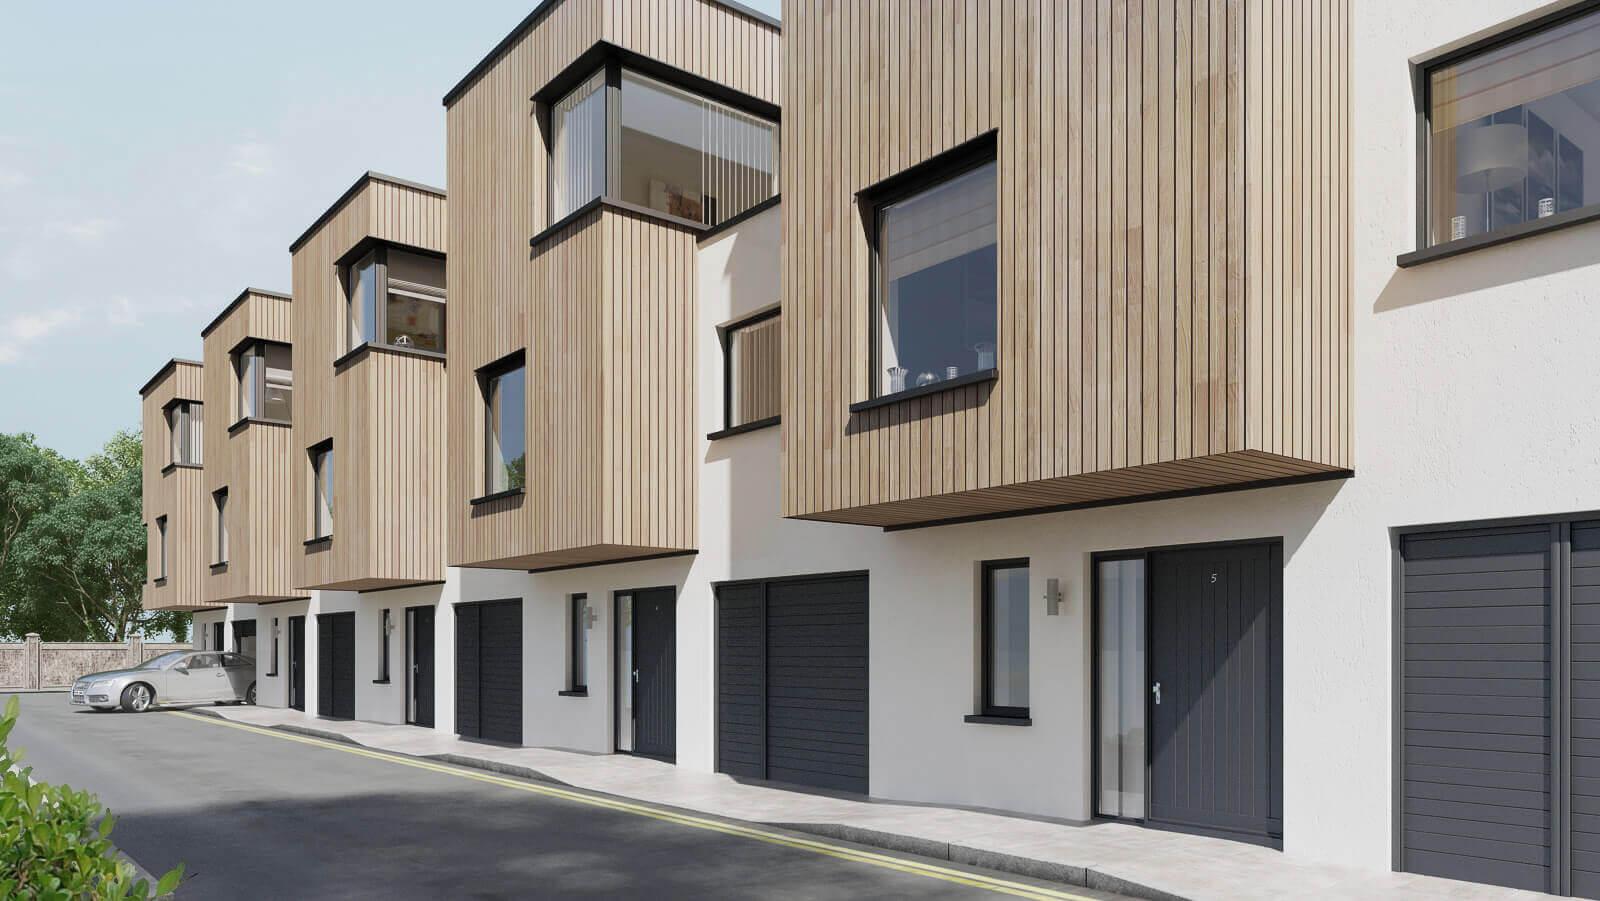 Urban Infill Dublin Oleary Sludds Architects